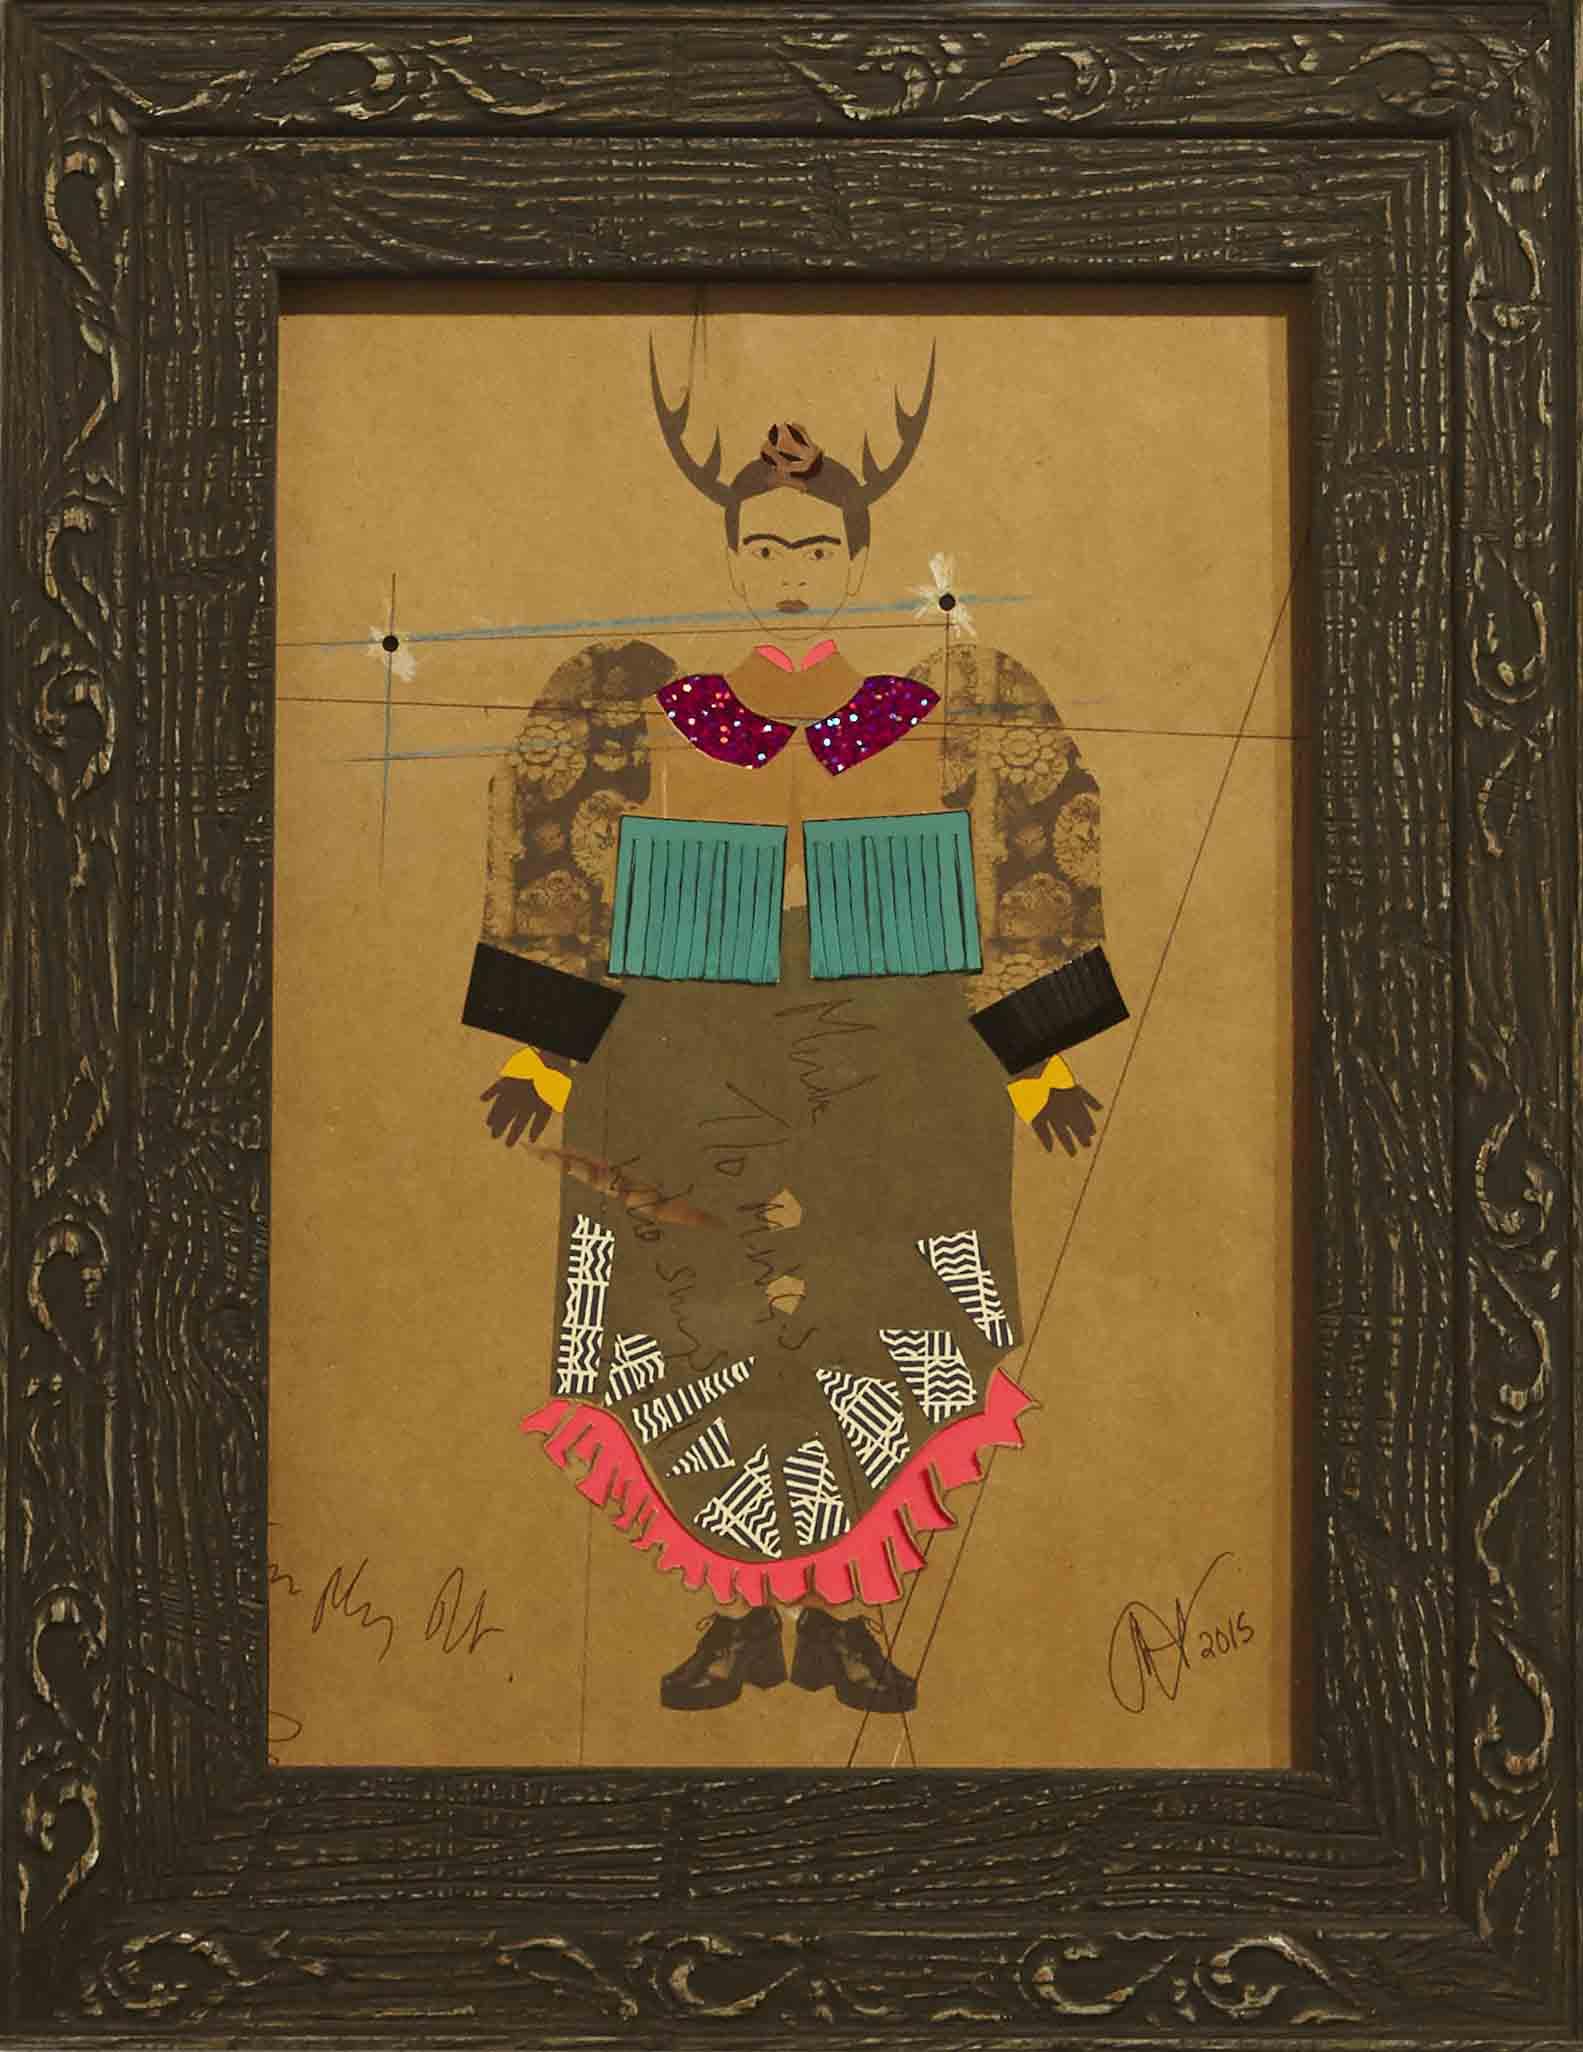 Frida-Wedding portrait Hormazd Narielwalla.jpg